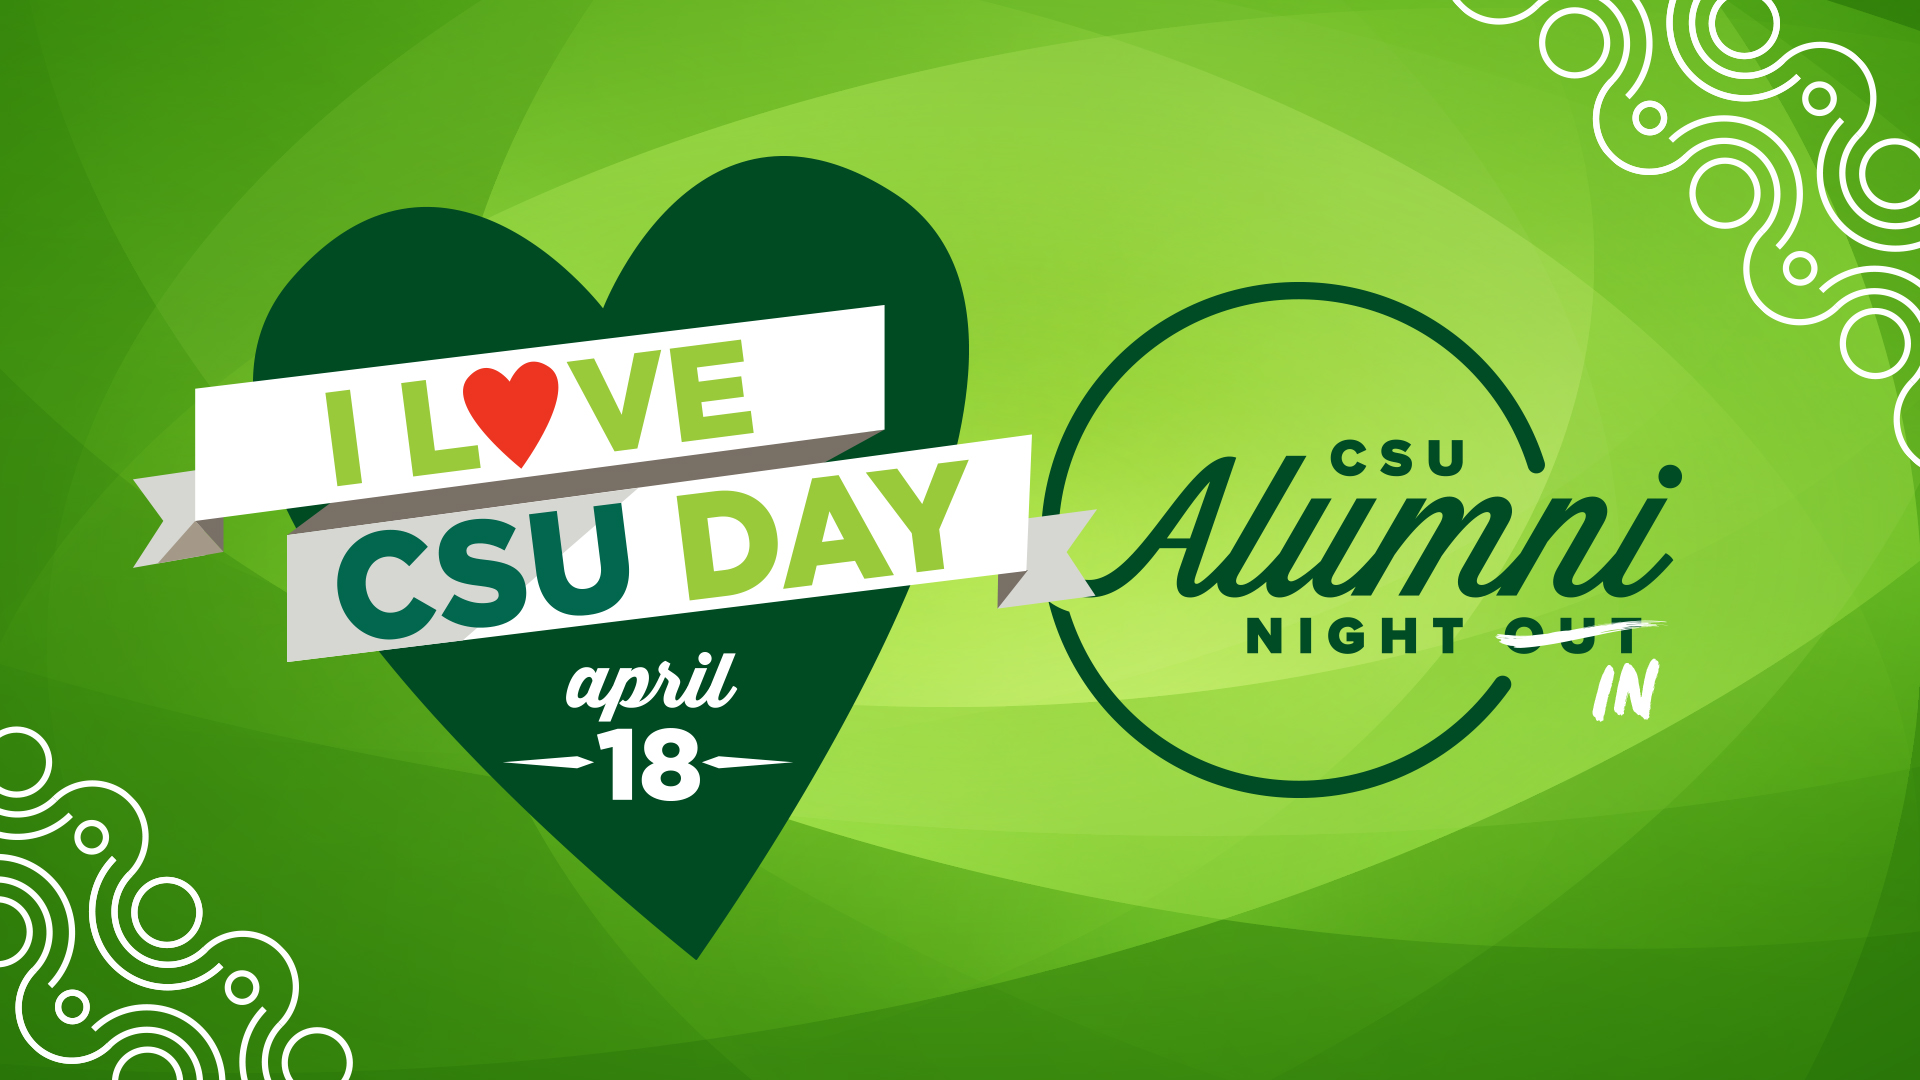 Image for Alumni Night In: I Love CSU Day Trivia webinar